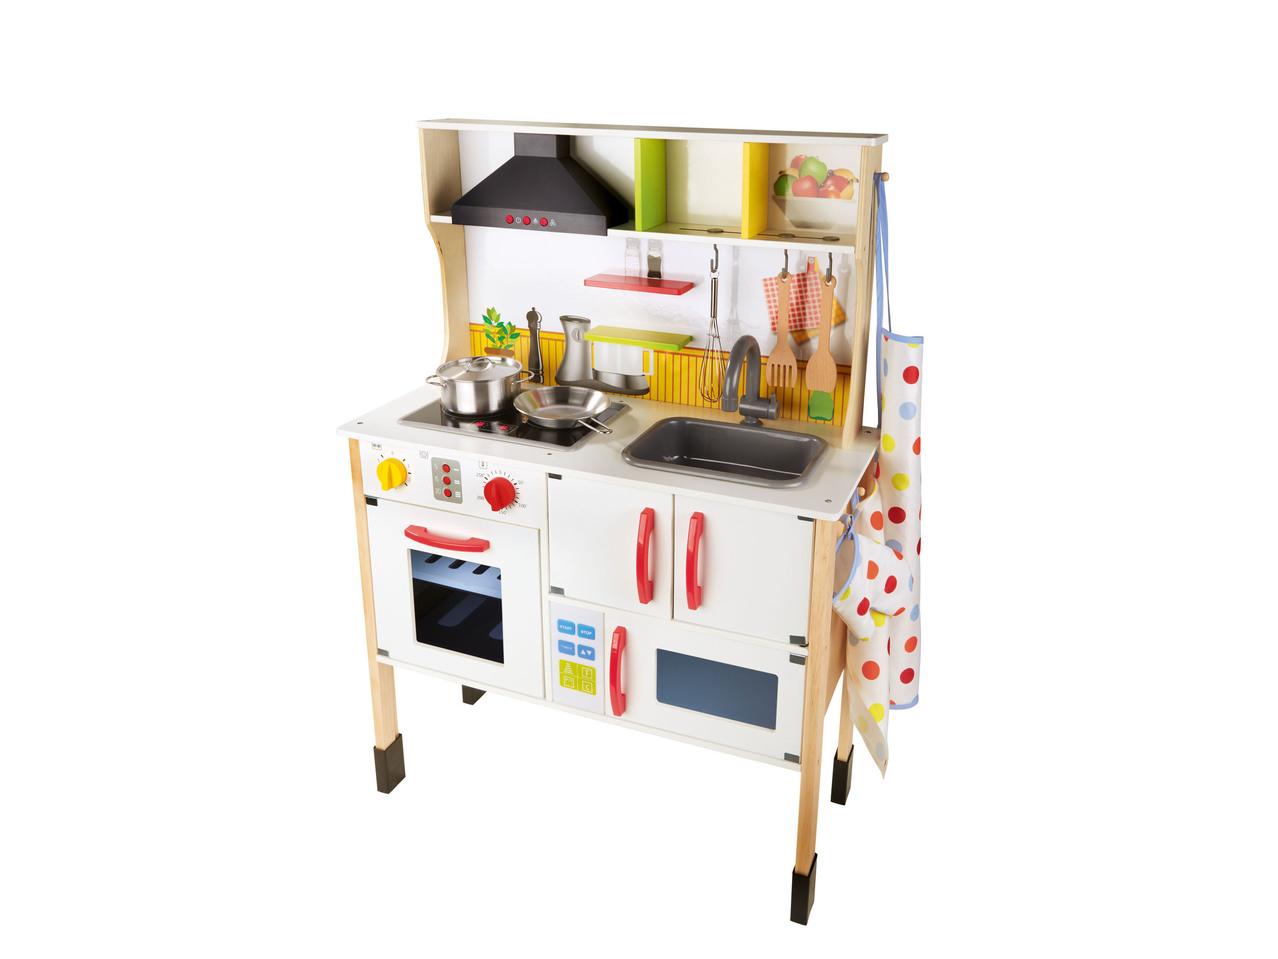 Wooden Play Kitchen Lidl Malta Specials Archive